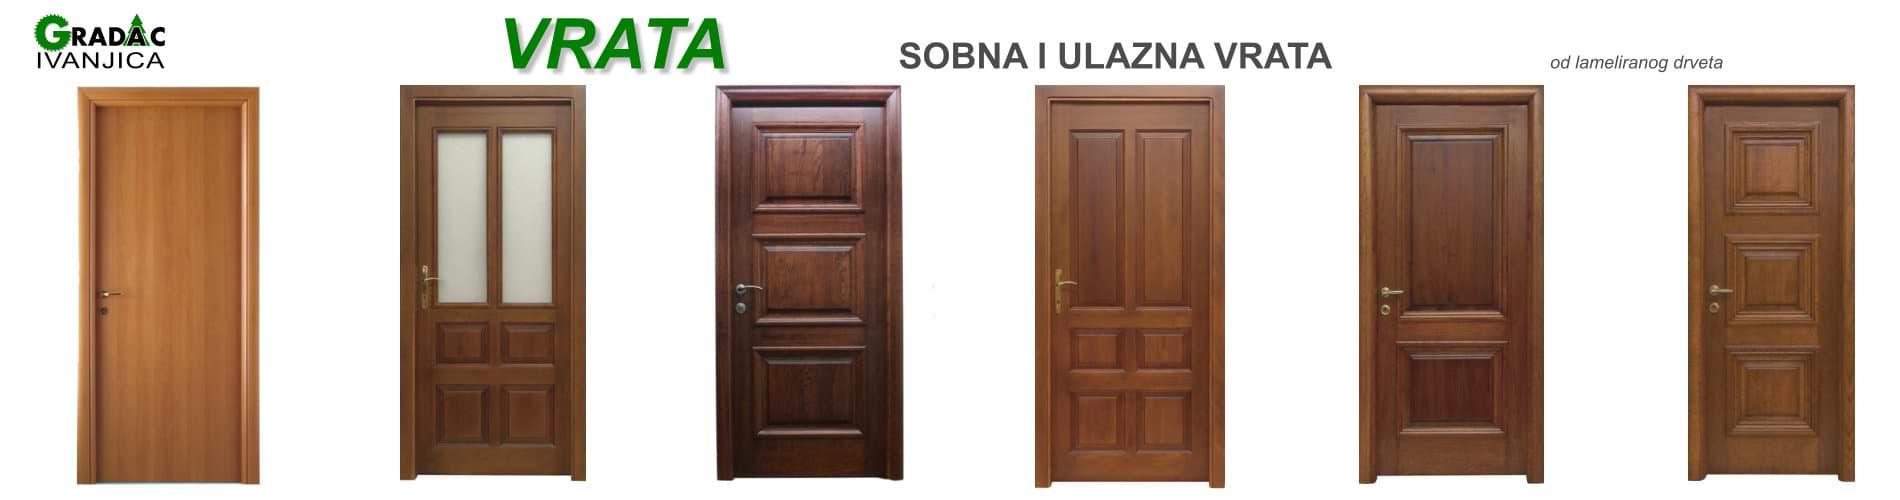 Vrata -  stolarija Gradac Ivanjica